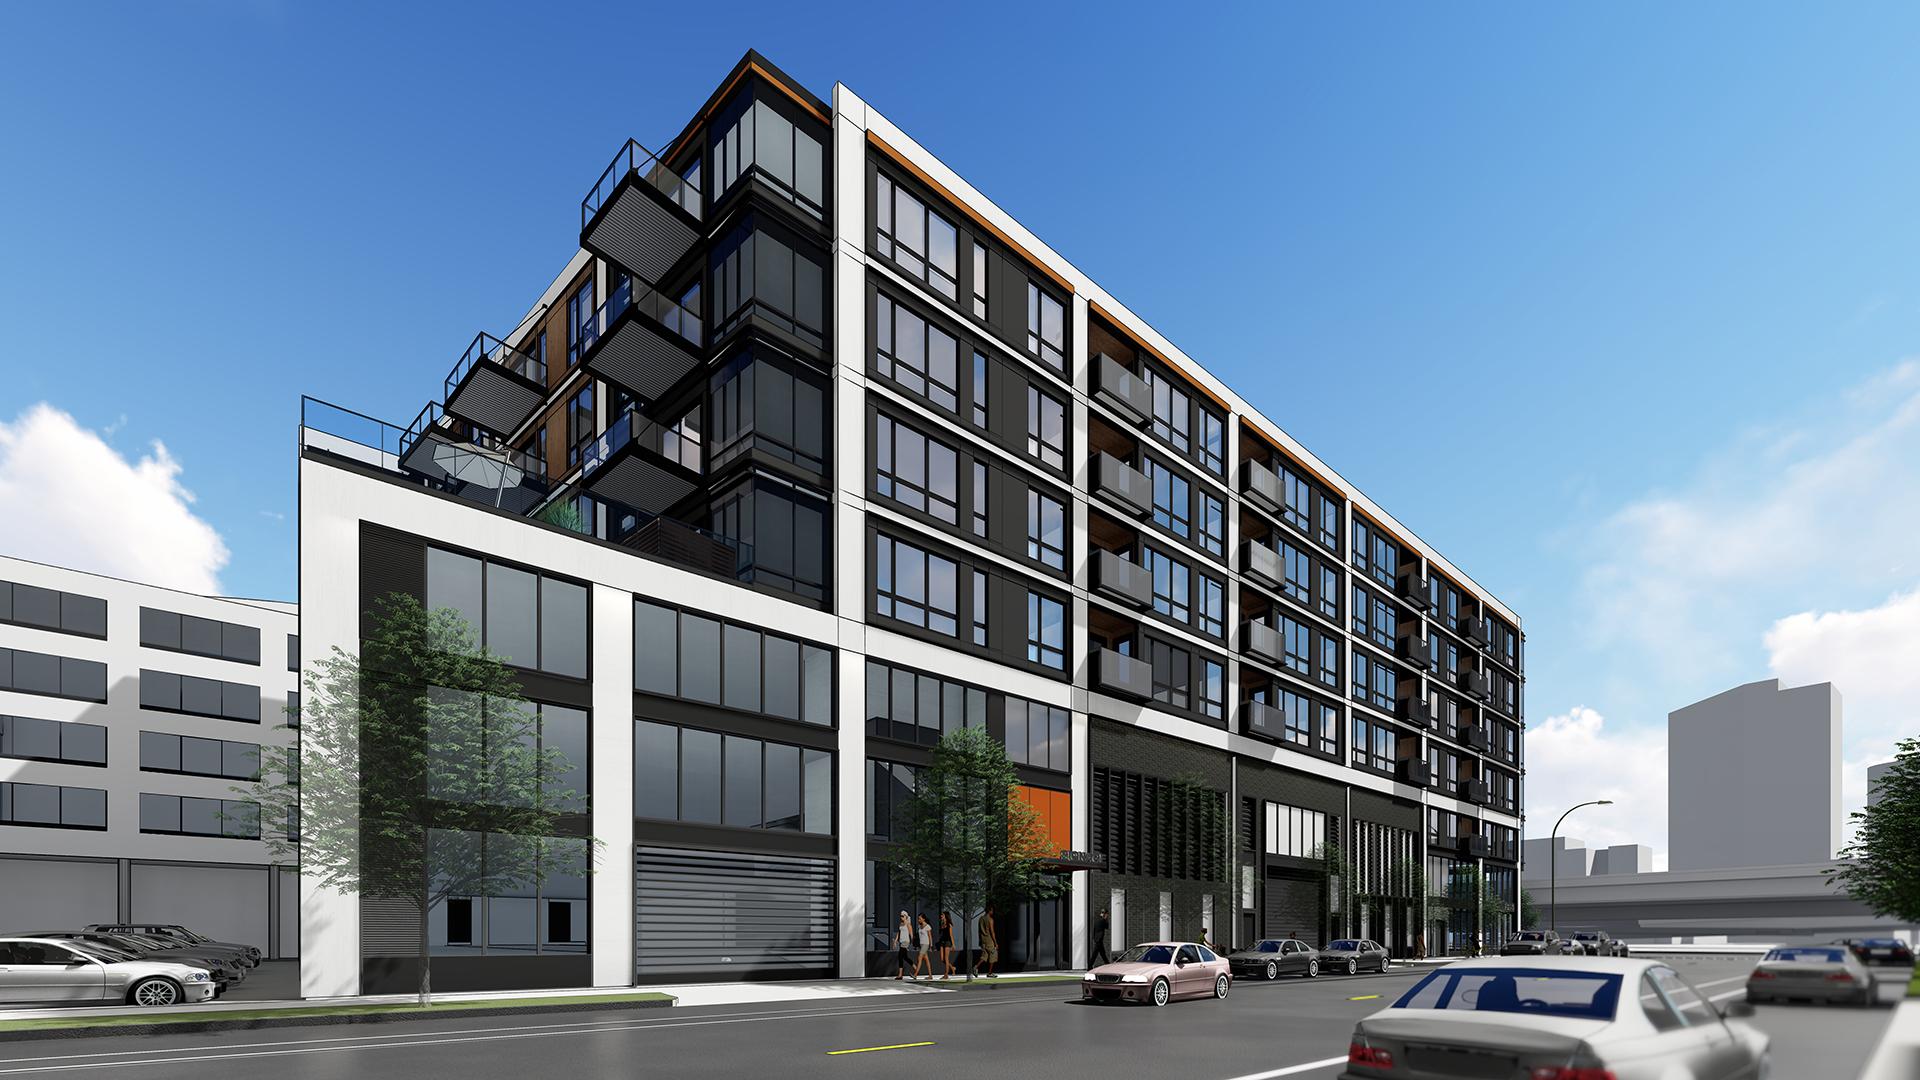 Jefferson rendering image of apartment